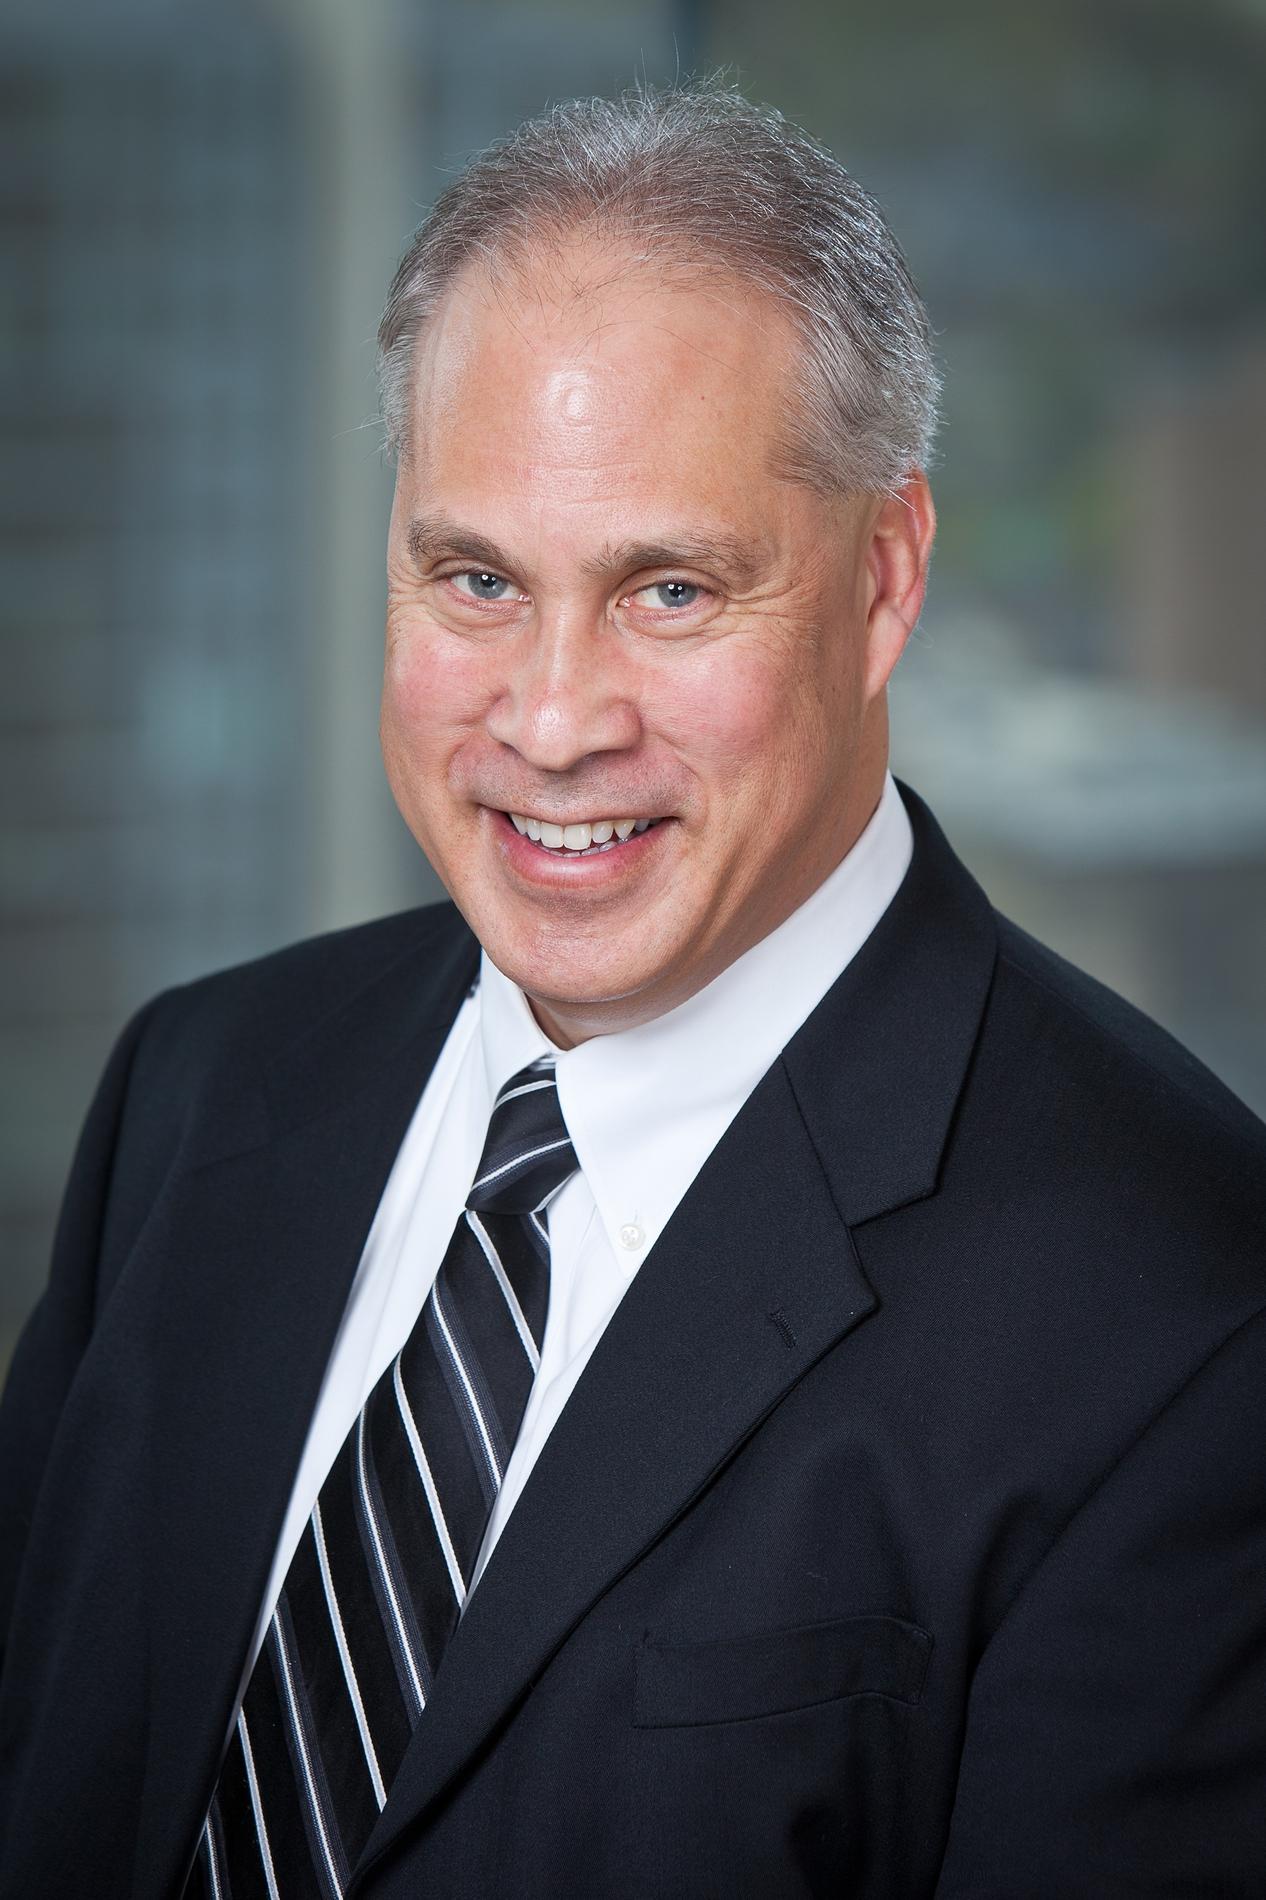 Jeremy Miller Portland Or Morgan Stanley Wealth